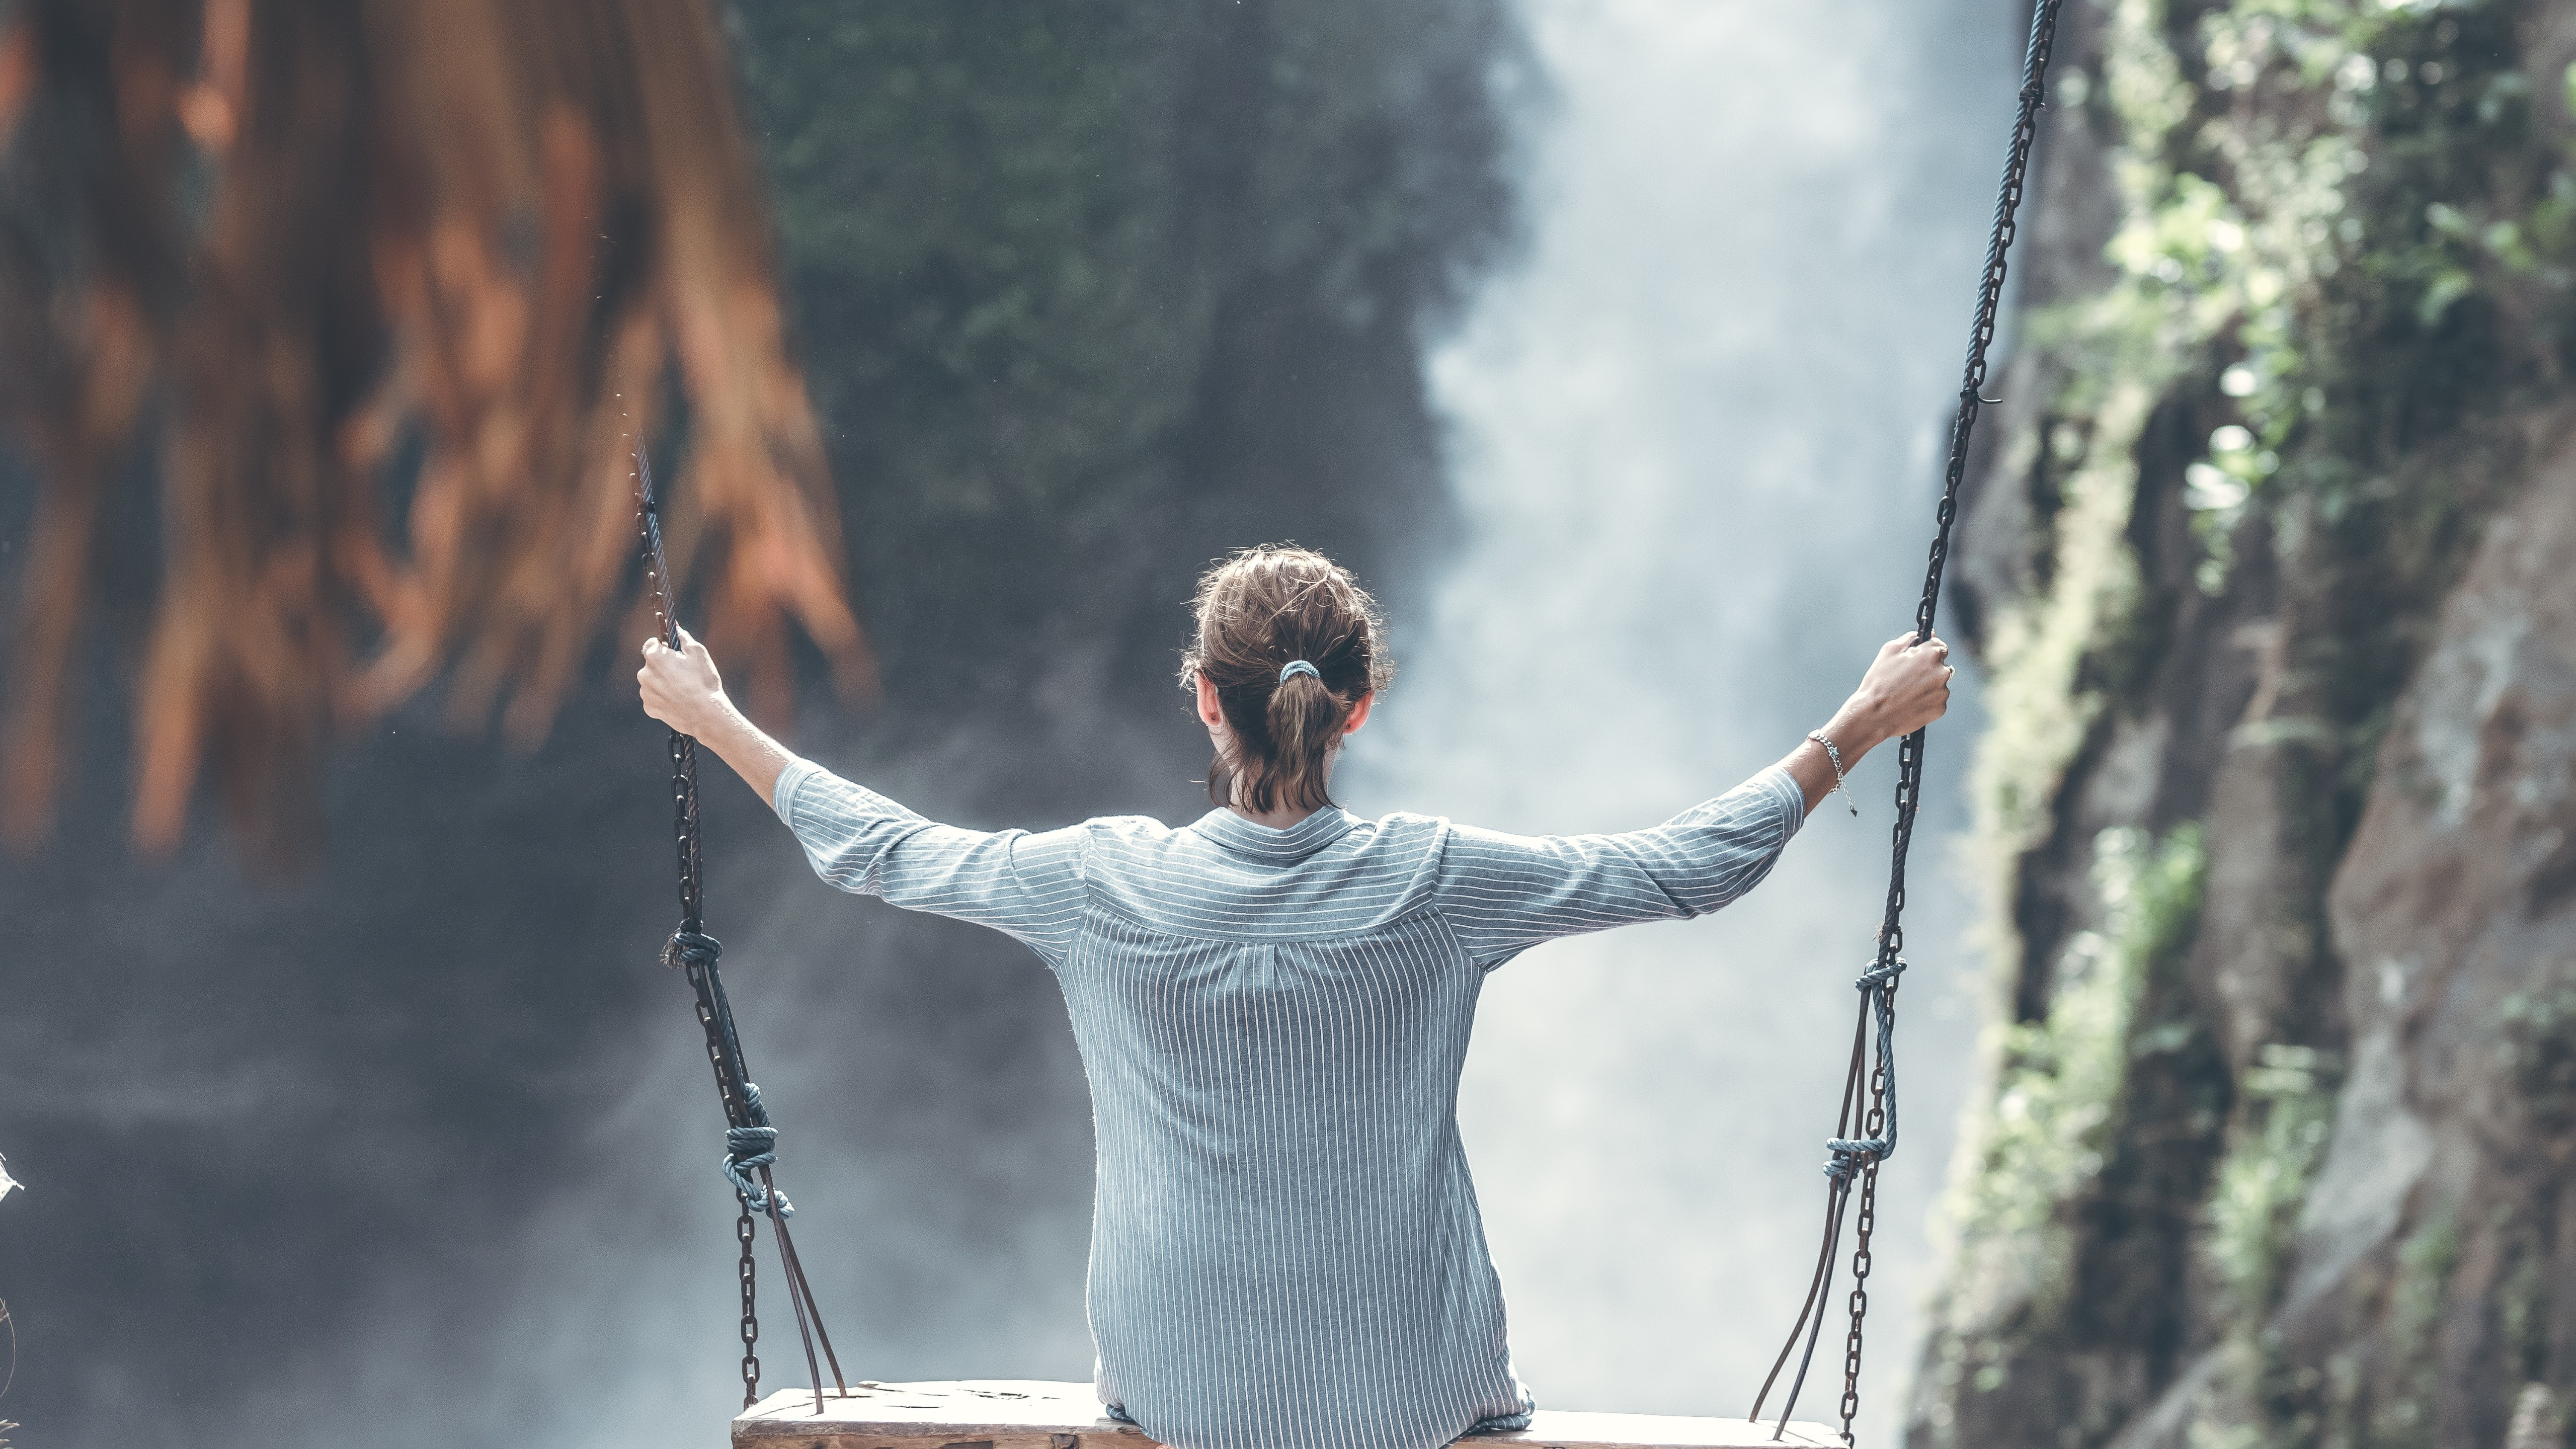 Fondos de pantalla Chica en columpio cerca de una cascada